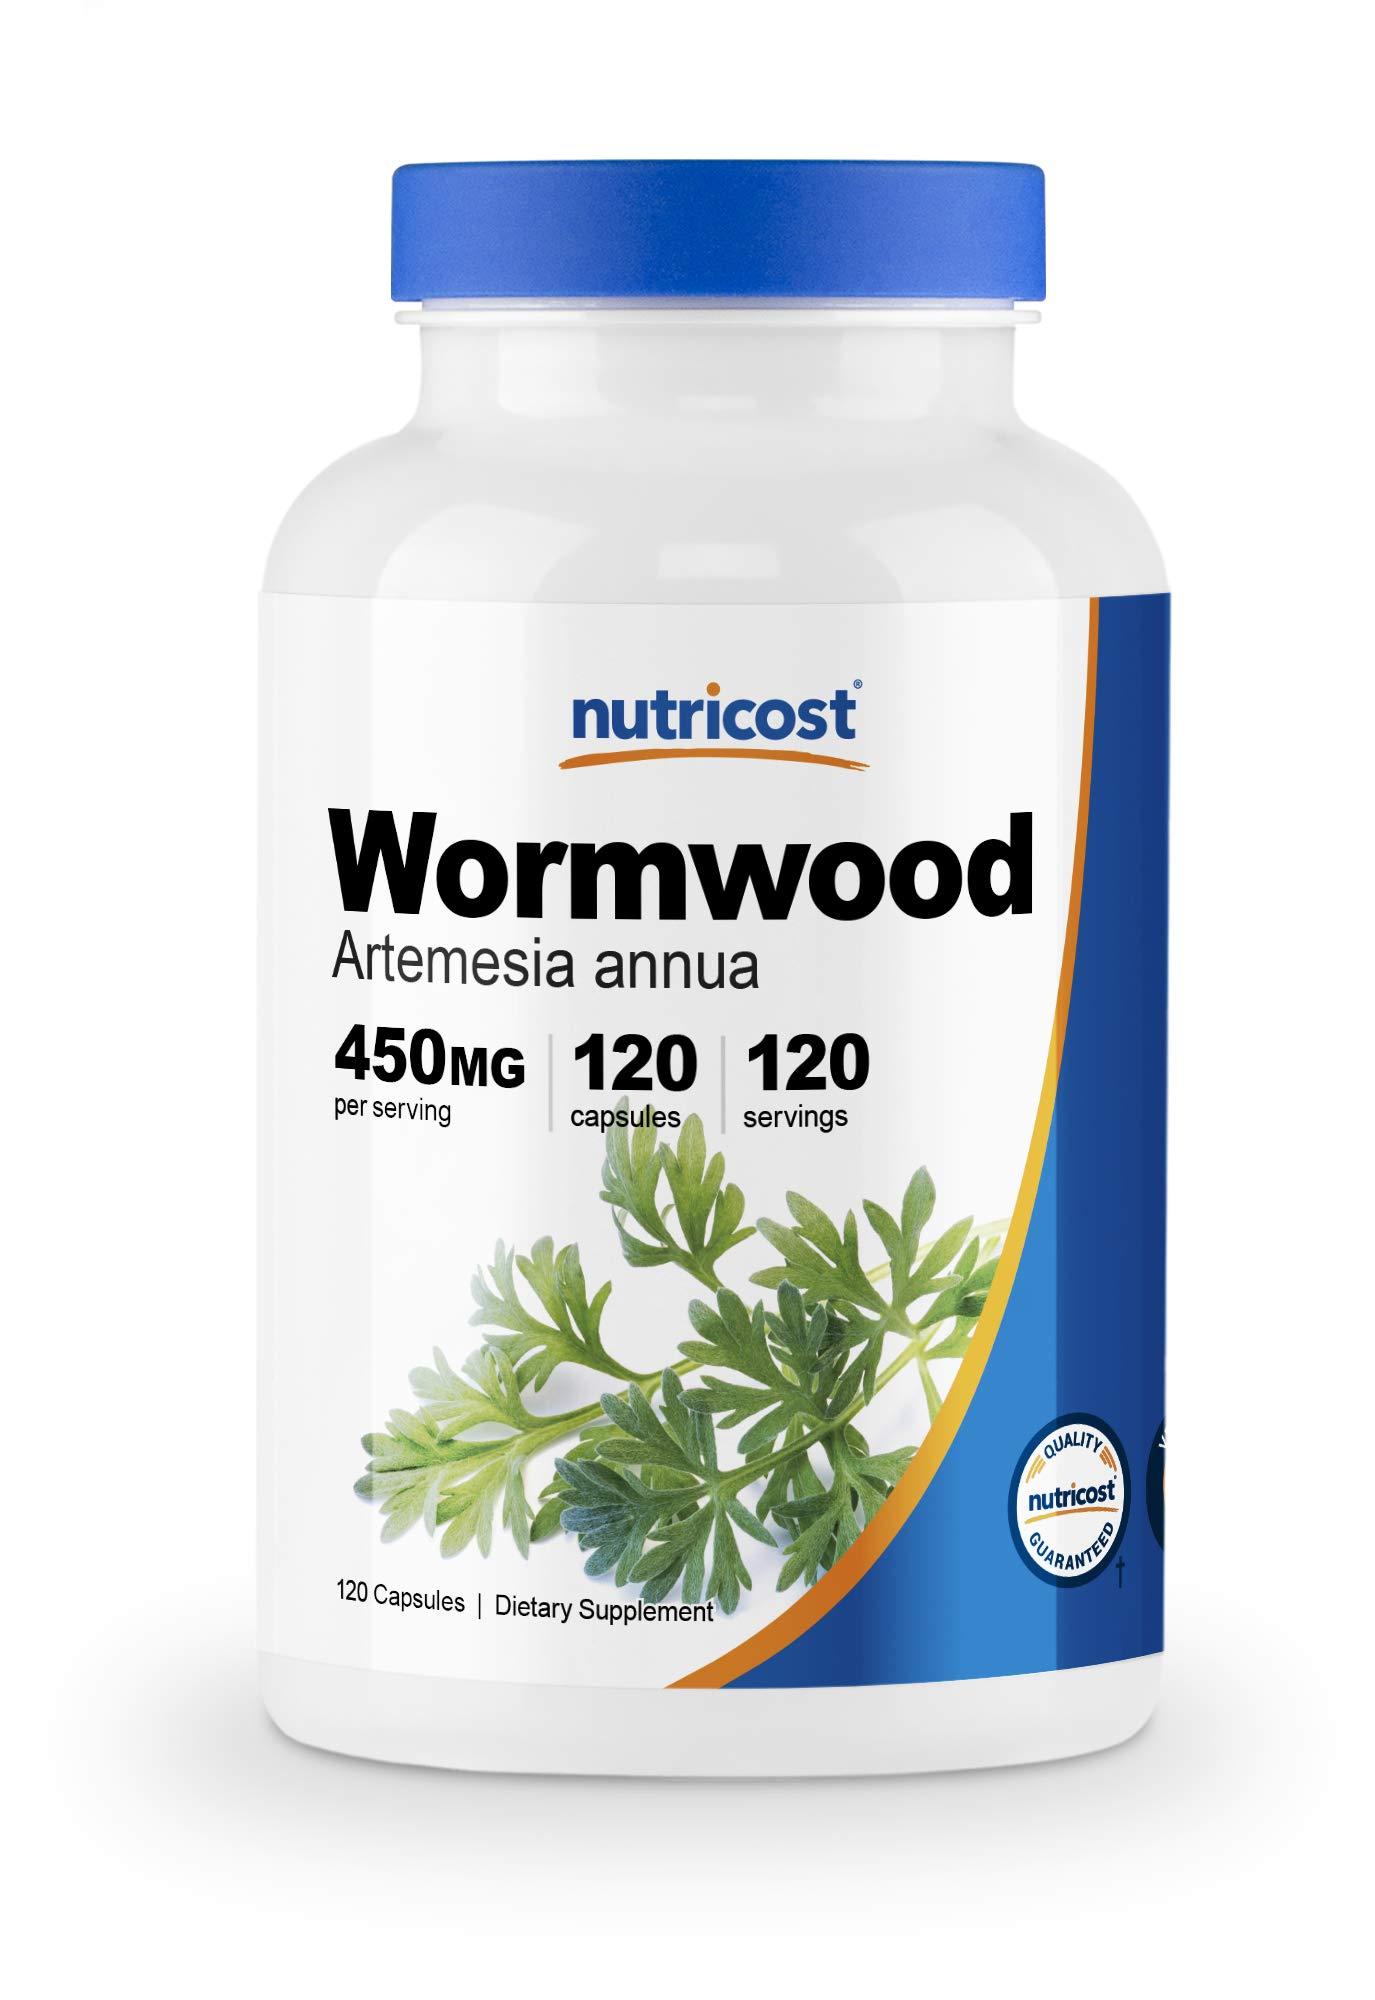 Nutricost Wormwood Capsules 450mg 120 Capsules - Vegetarian Caps, Gluten Free and Non-GMO